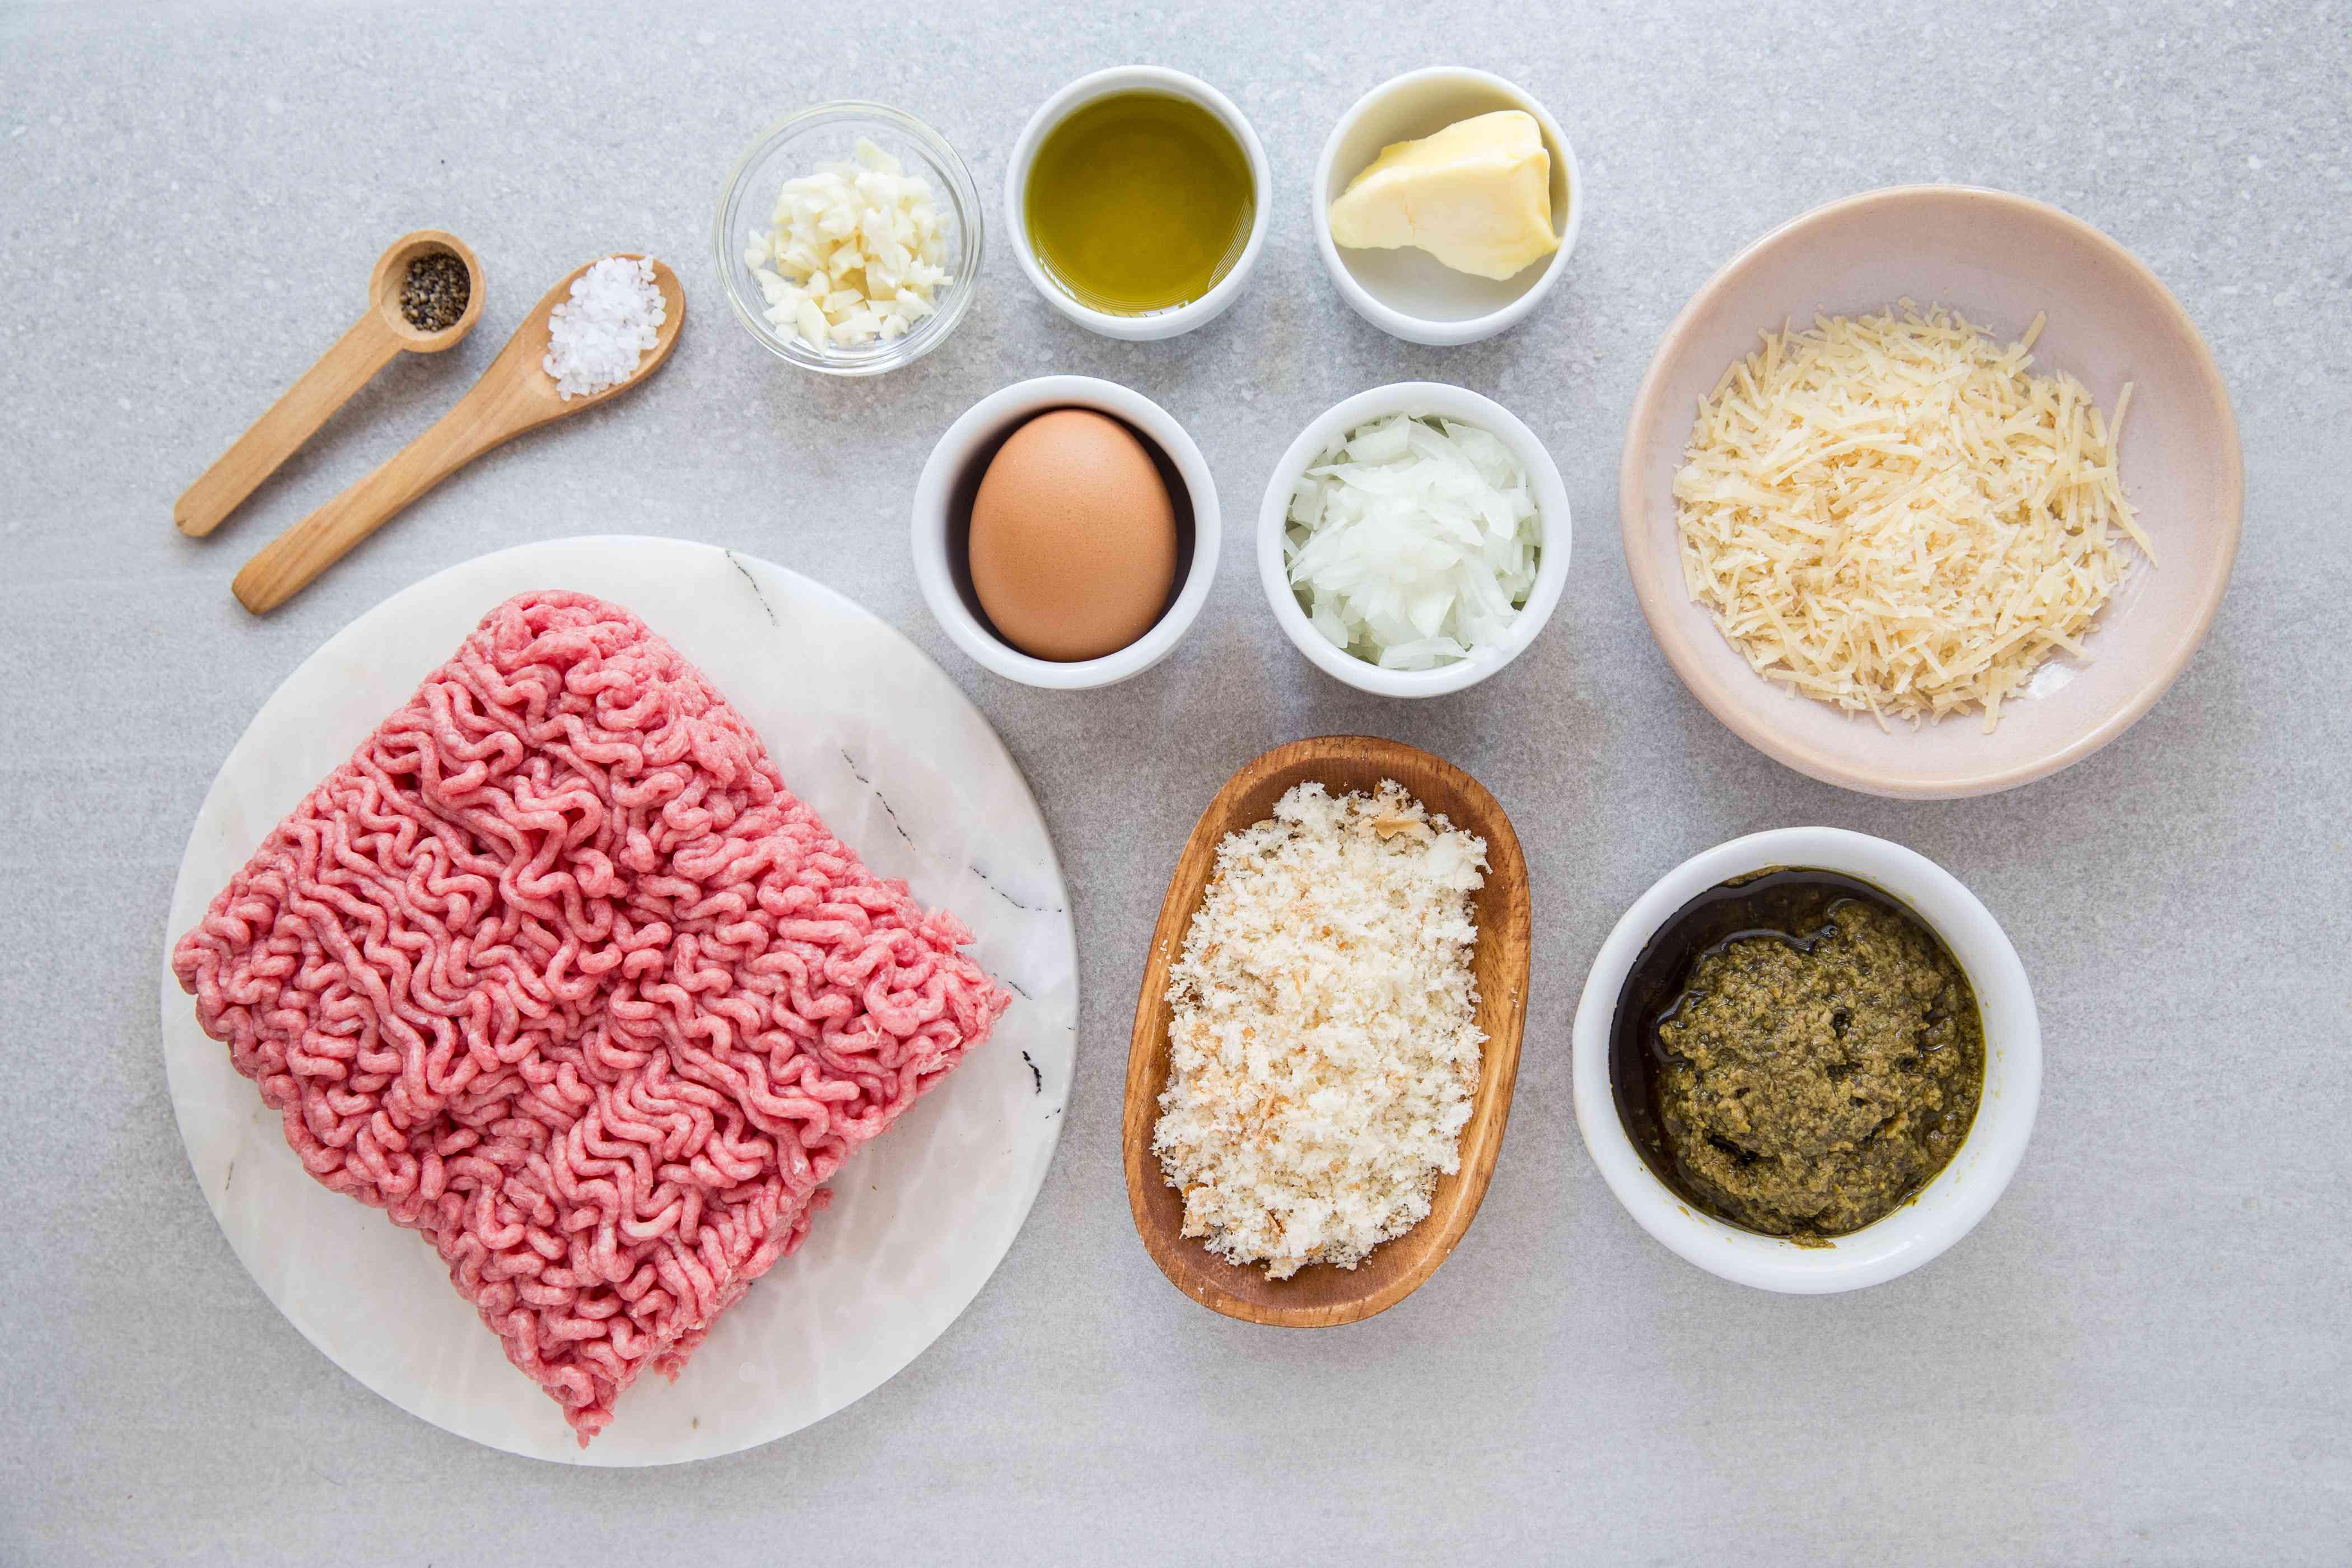 Pesto Meatballs ingredients